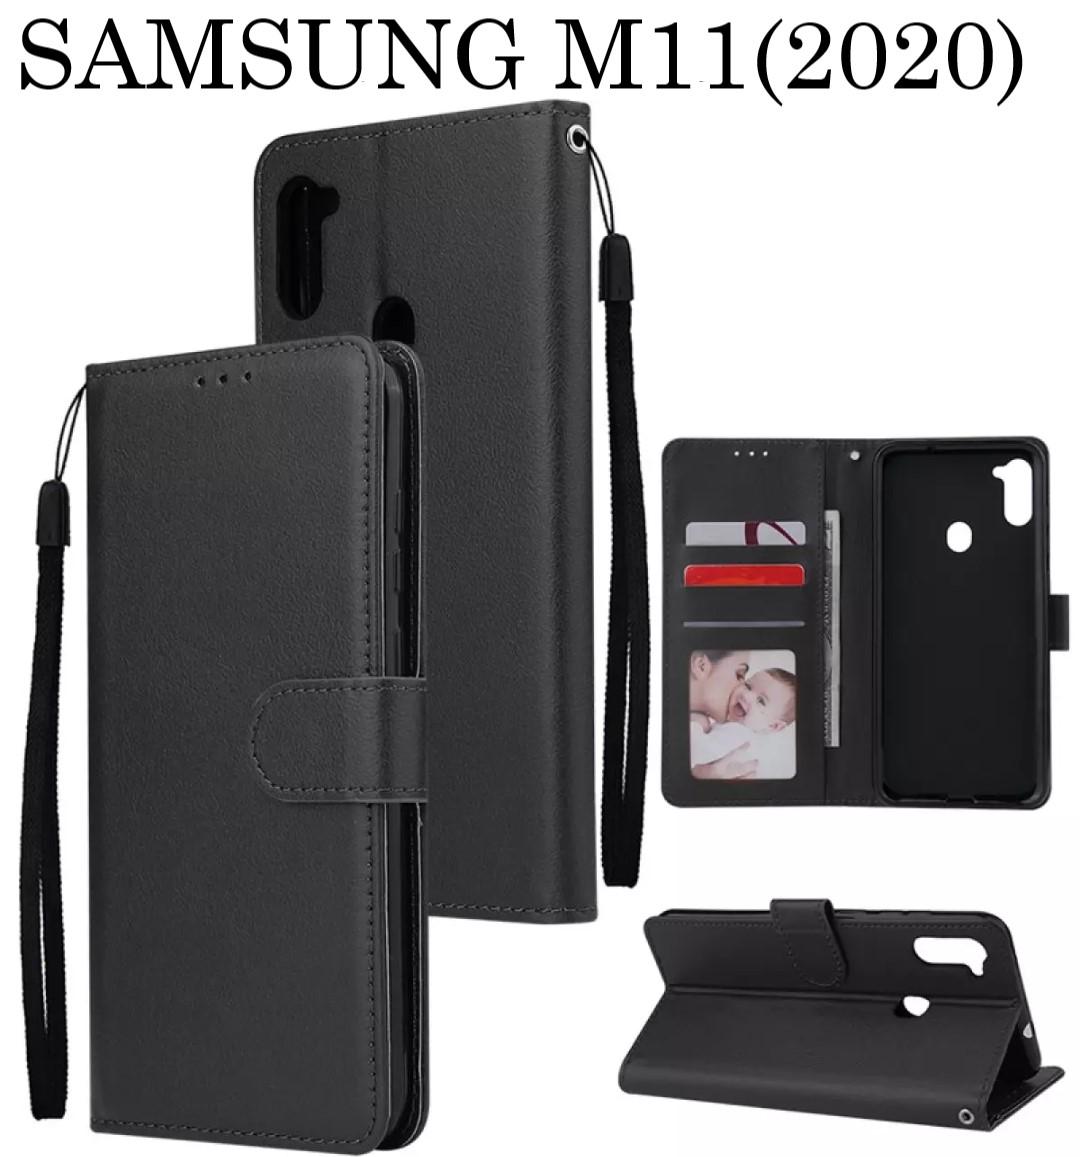 leather case flip untuk samsung m21 (2020) -flip  wallet case kulit samsung m21 (2020)- casing dompet-flip cover leather-sarung buku hp